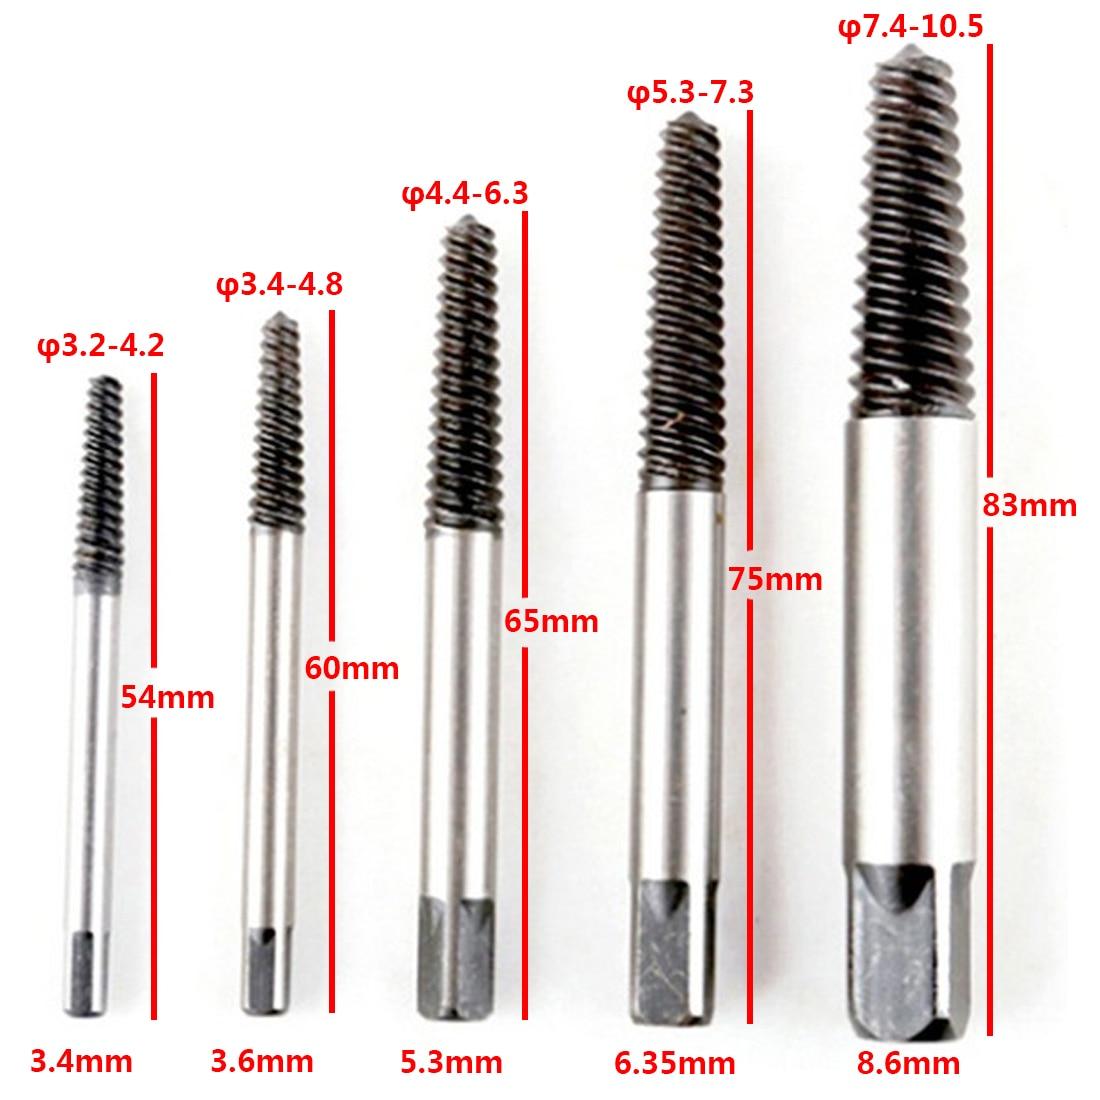 Carbon Steel 5pcs/set Screw Extractor Broken Bolt Remover Drill Guide Bits Set